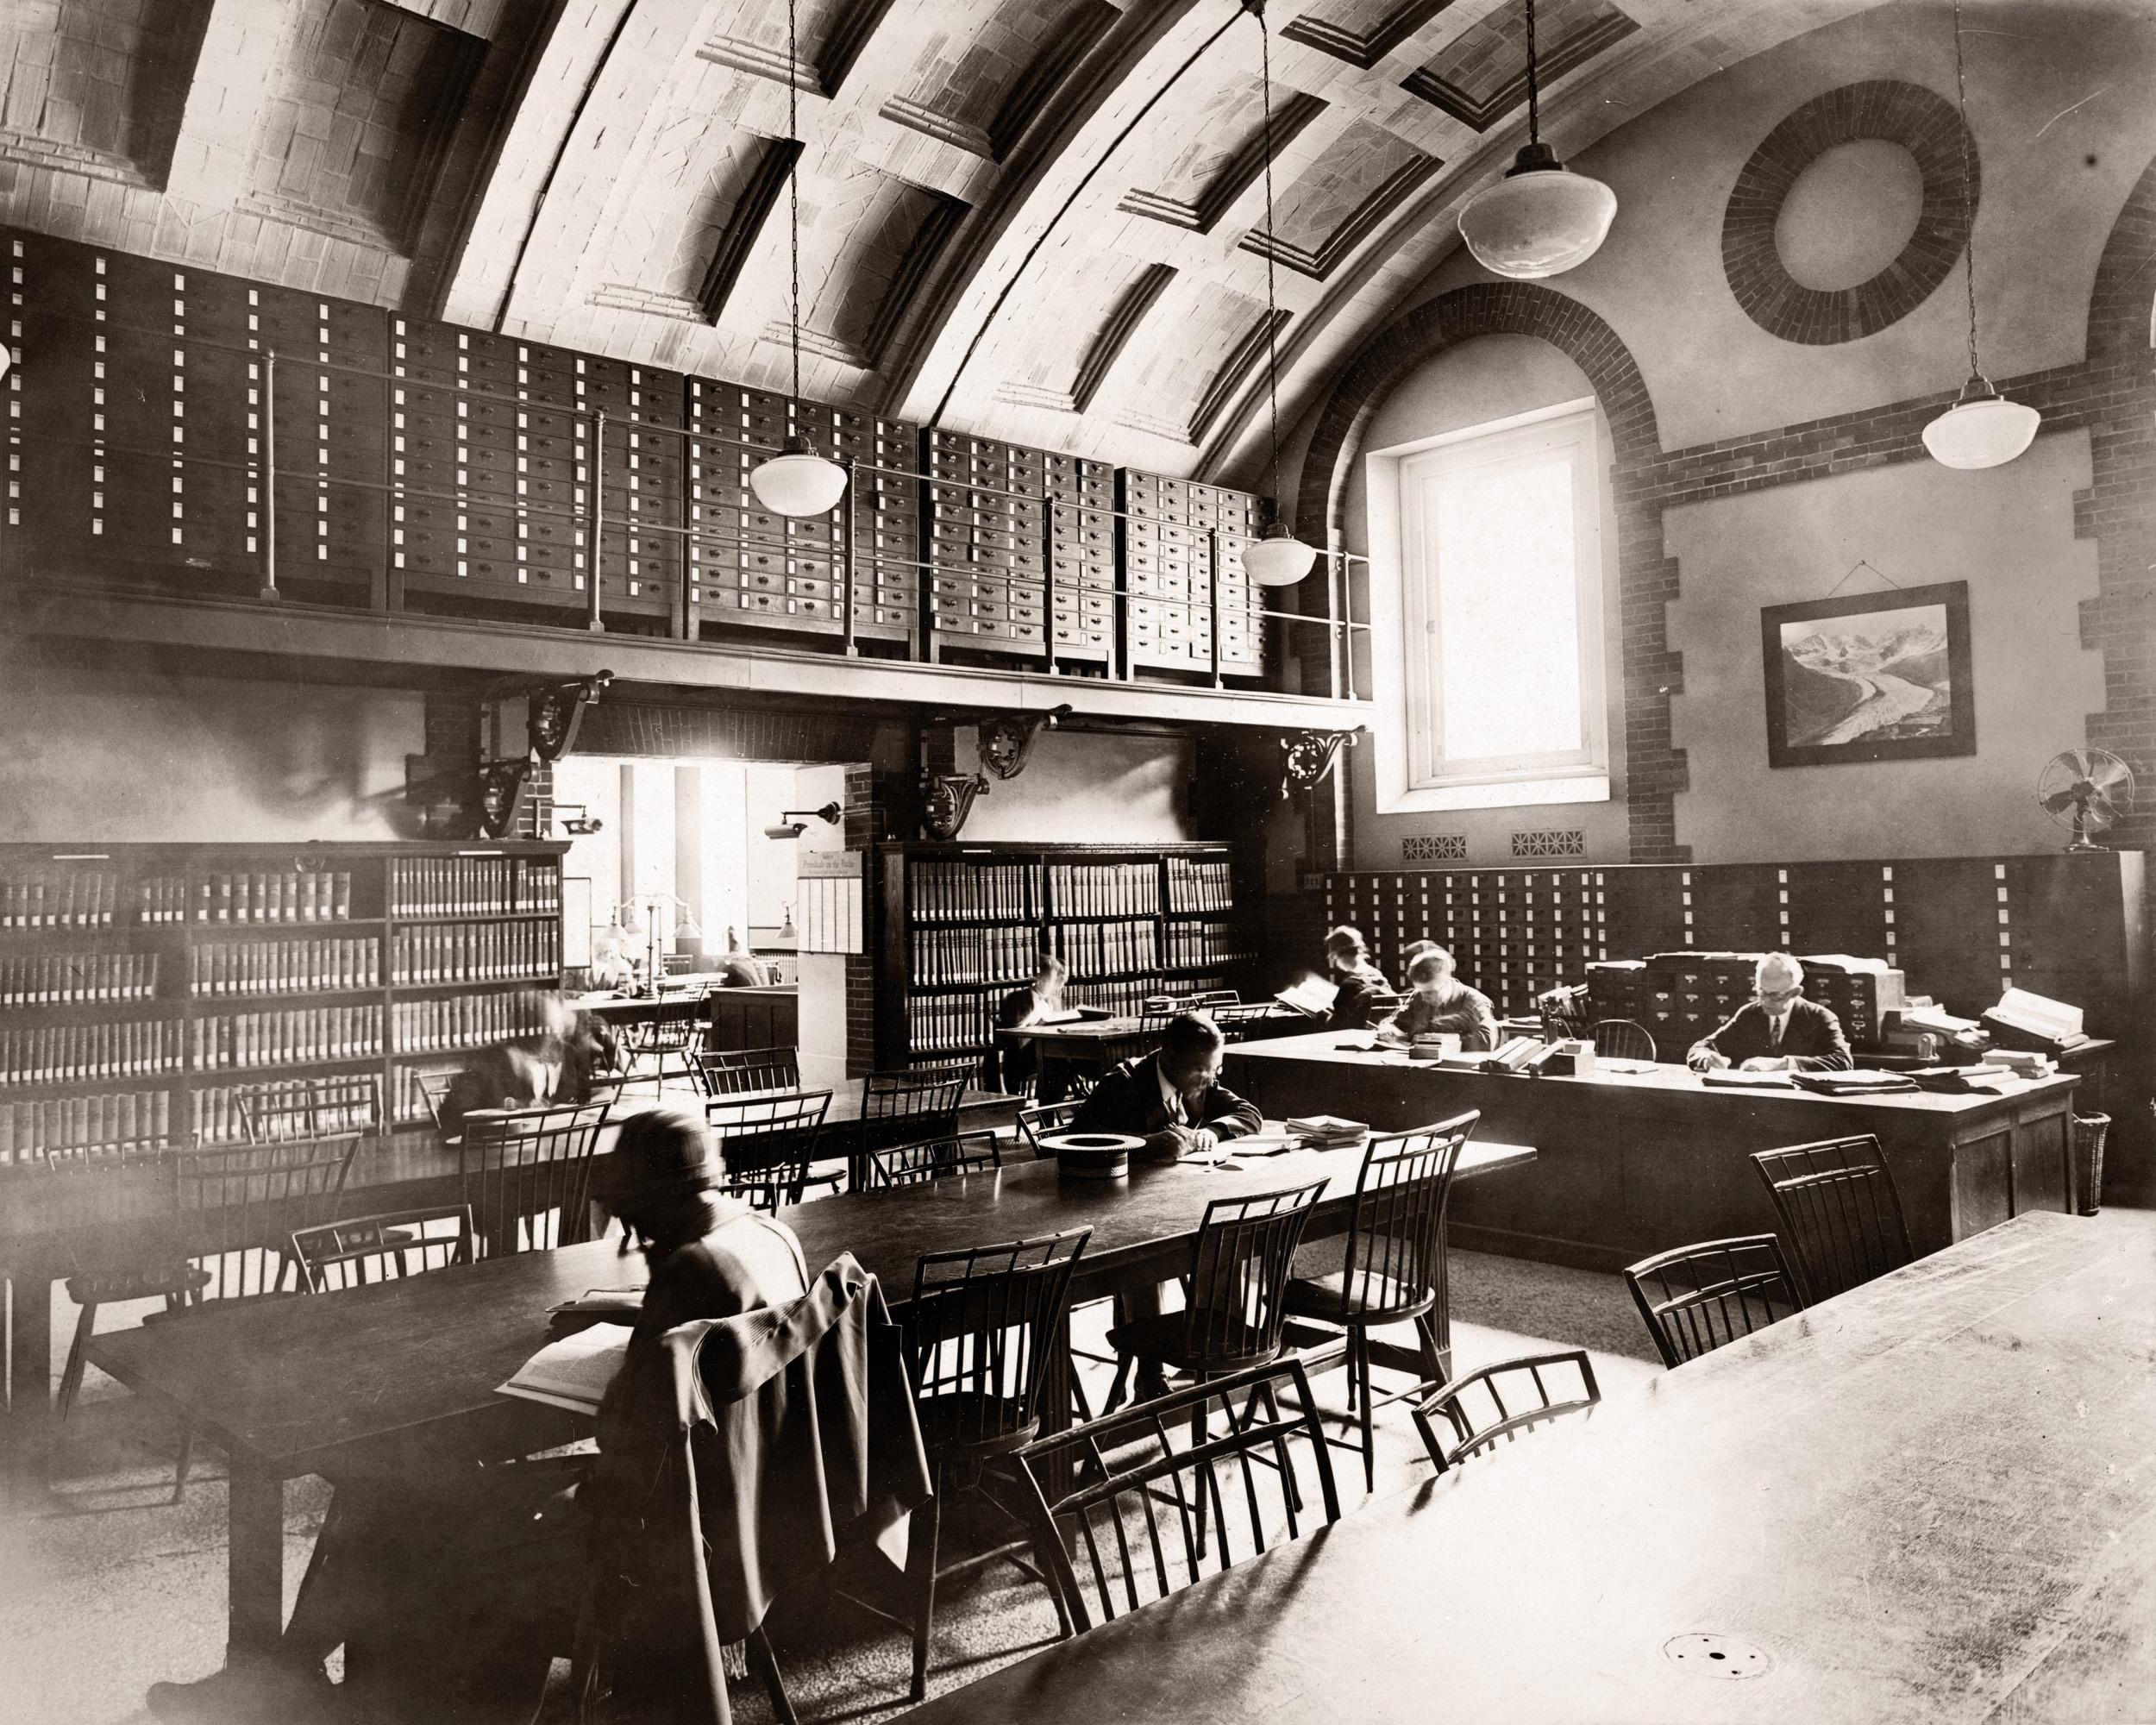 Boston Public Library, Reading Room